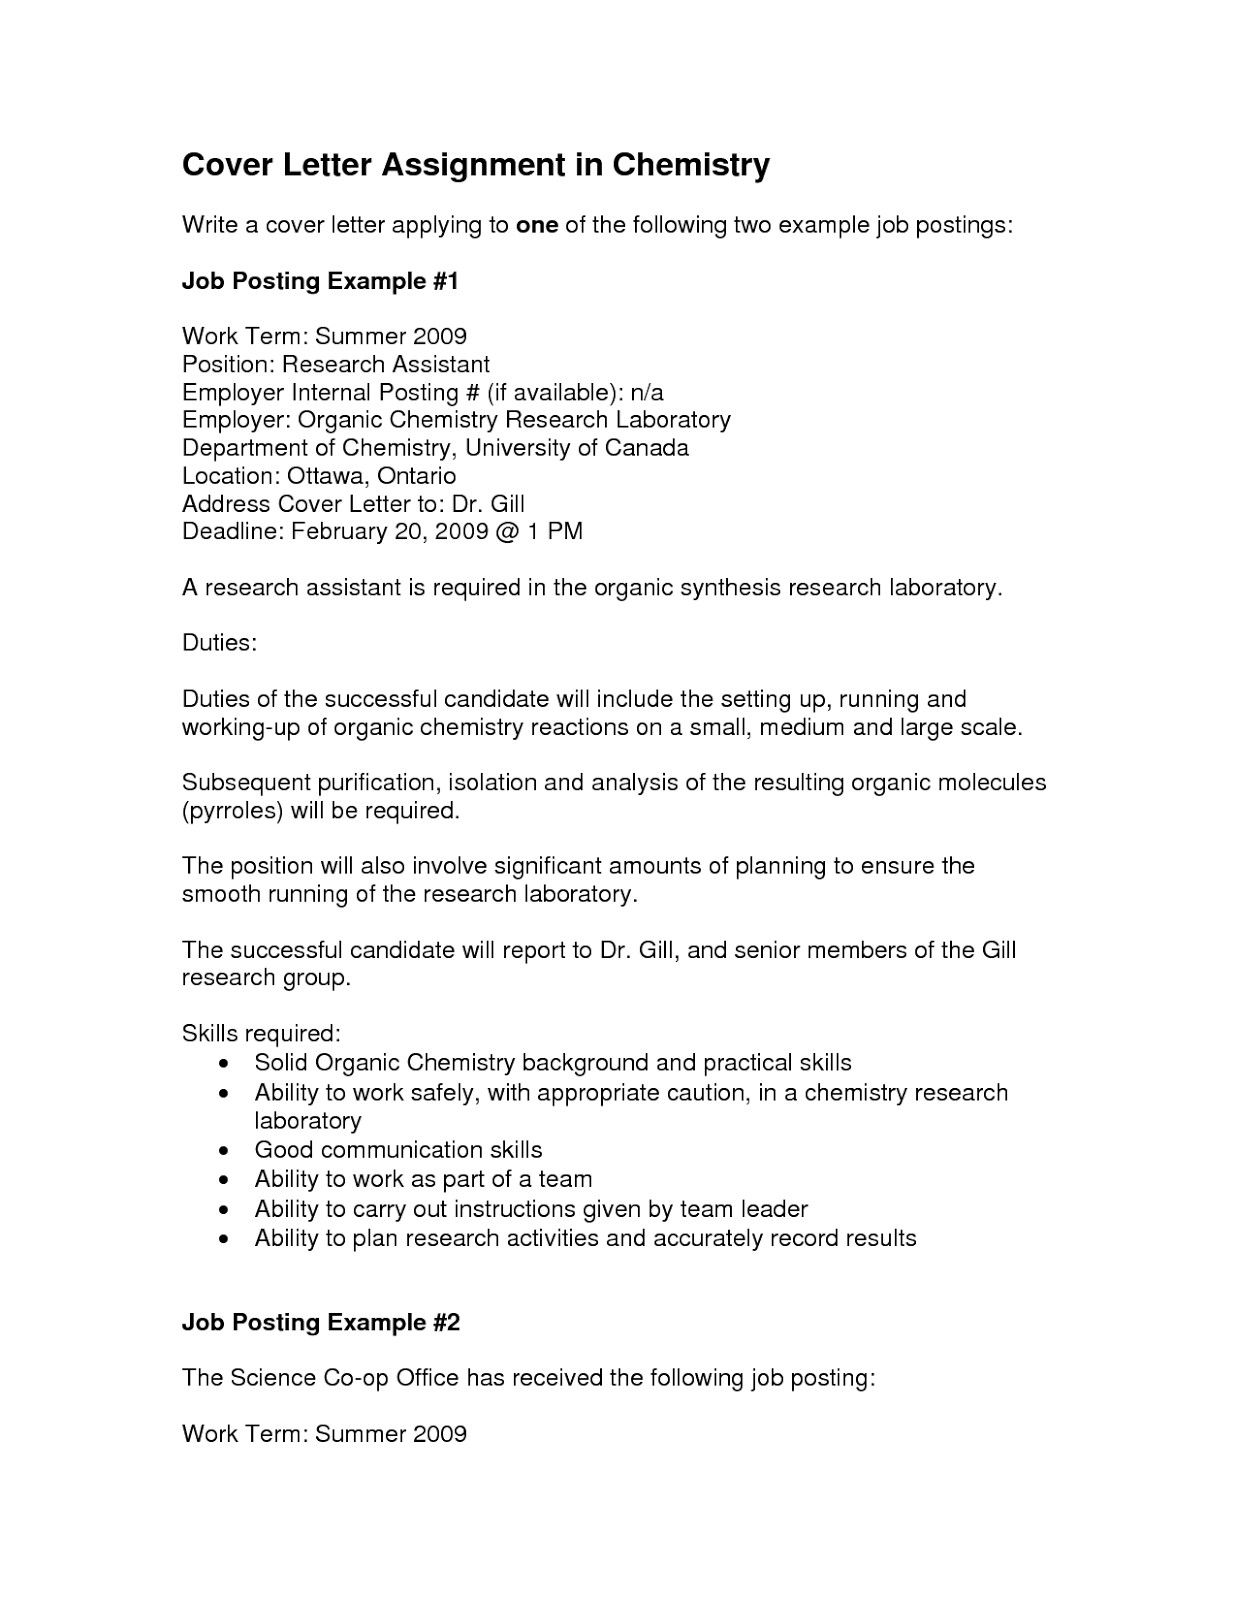 Applying For An Internal Position Resume Sample : applying, internal, position, resume, sample, Cover, Letter, Template, Internal, Position, Resume, Format, Letter,, Posting,